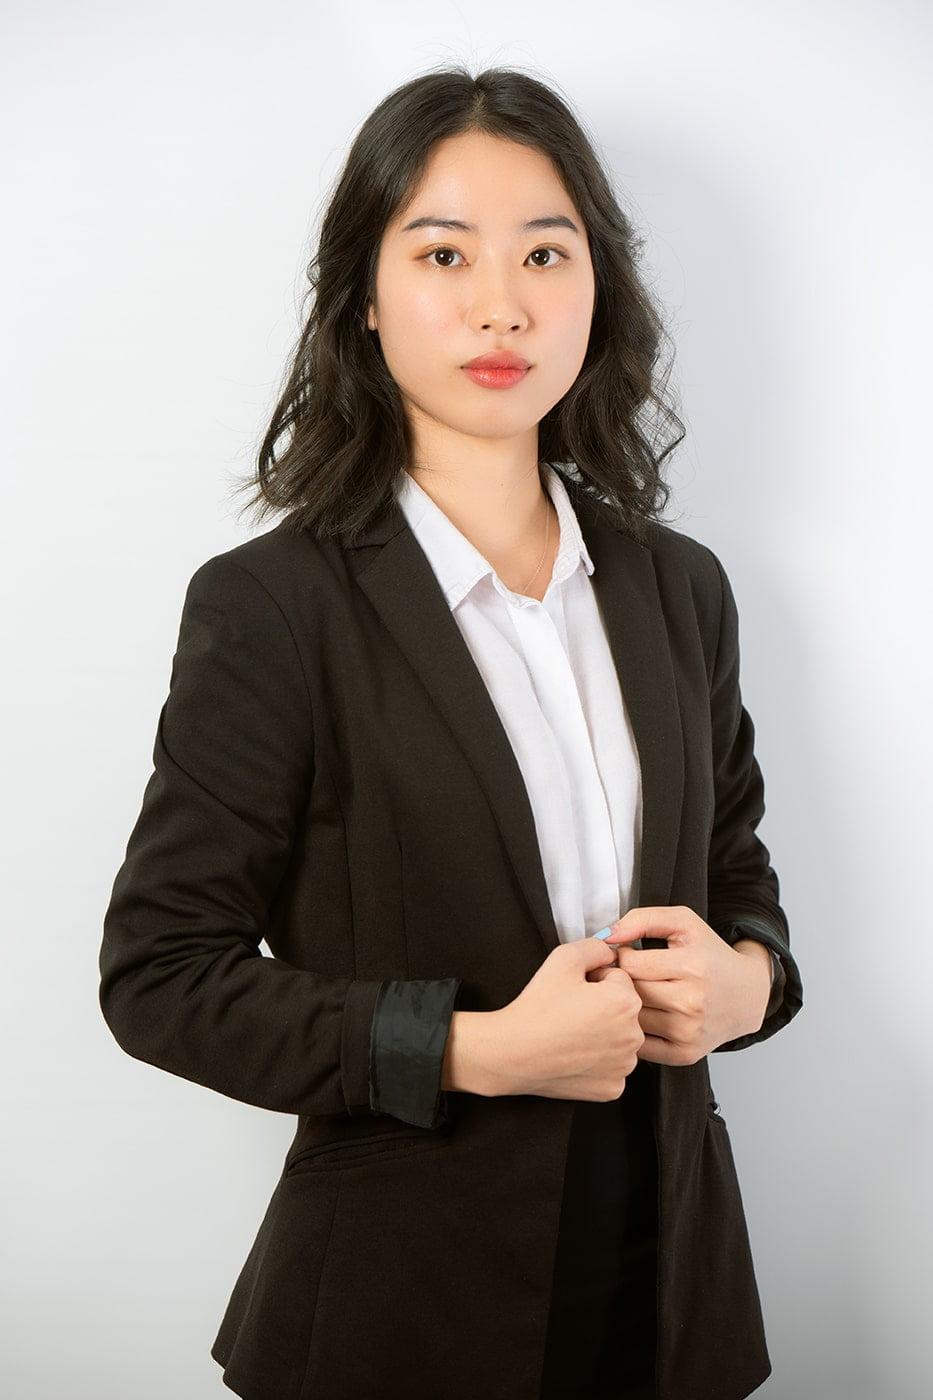 Profile cong ty 20 - Album chụp ảnh profile công ty Luật Dzungsrt Law - HThao Studio